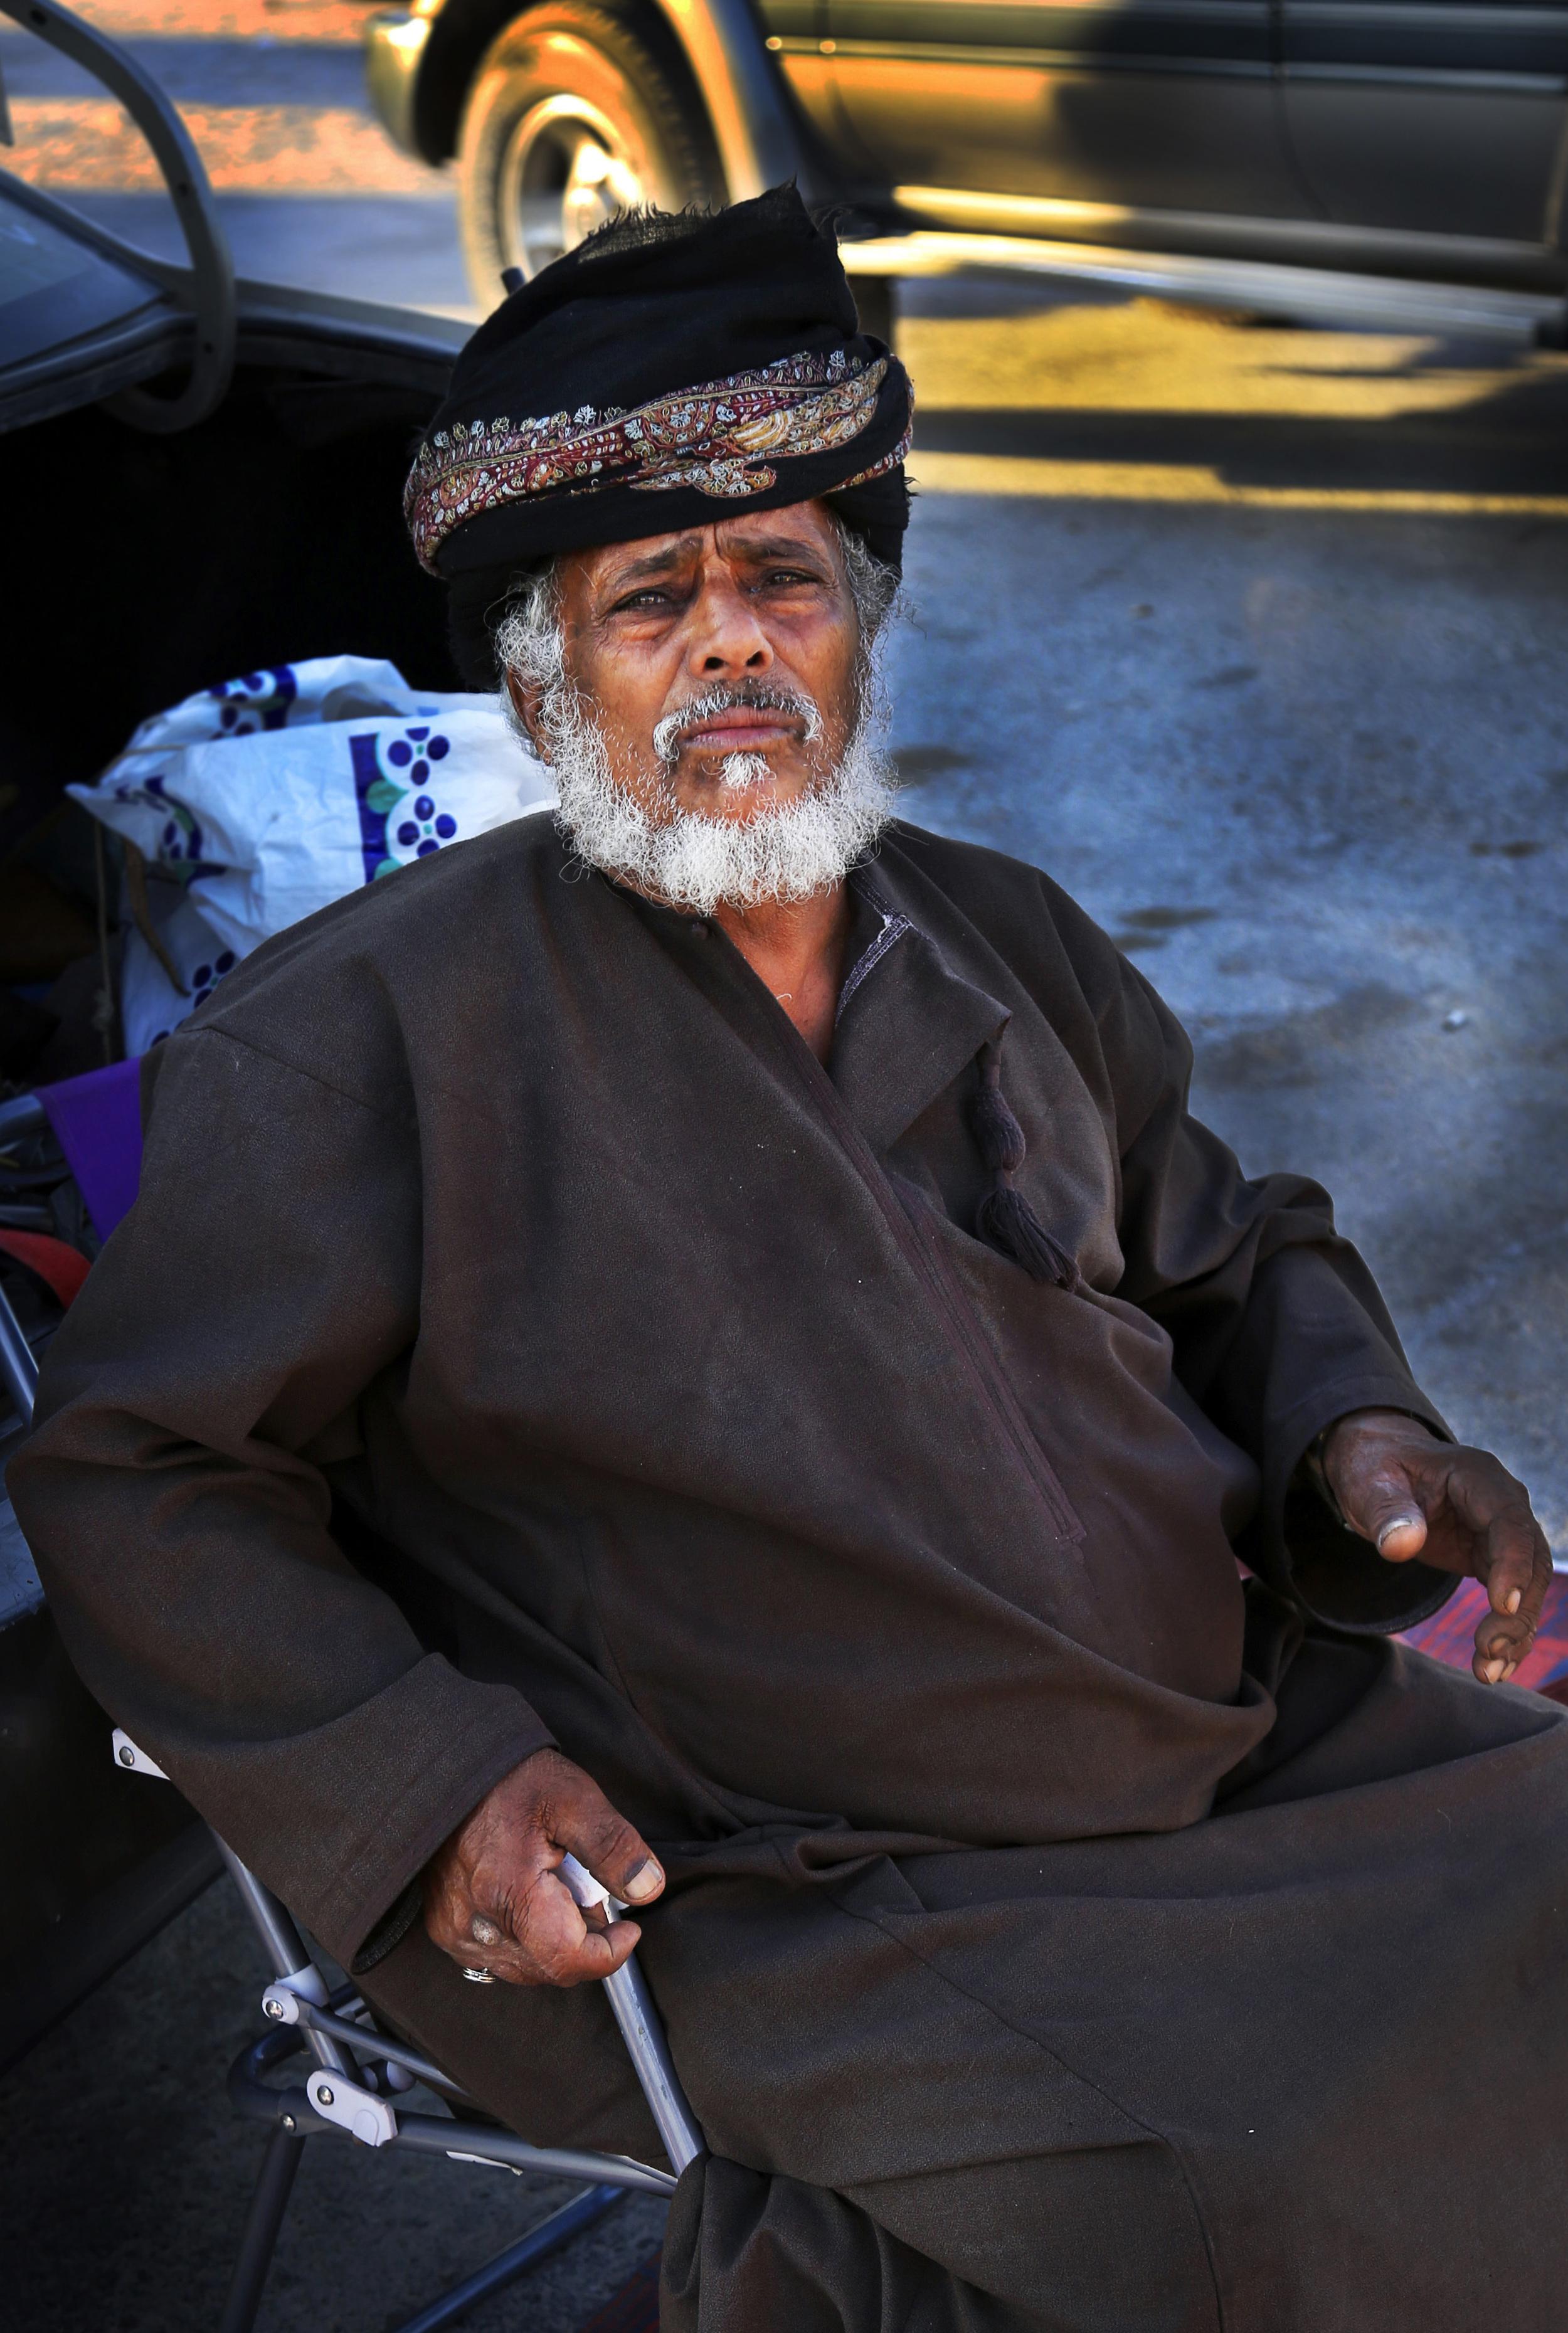 Saving Oman's daggers: women cut to the chase -